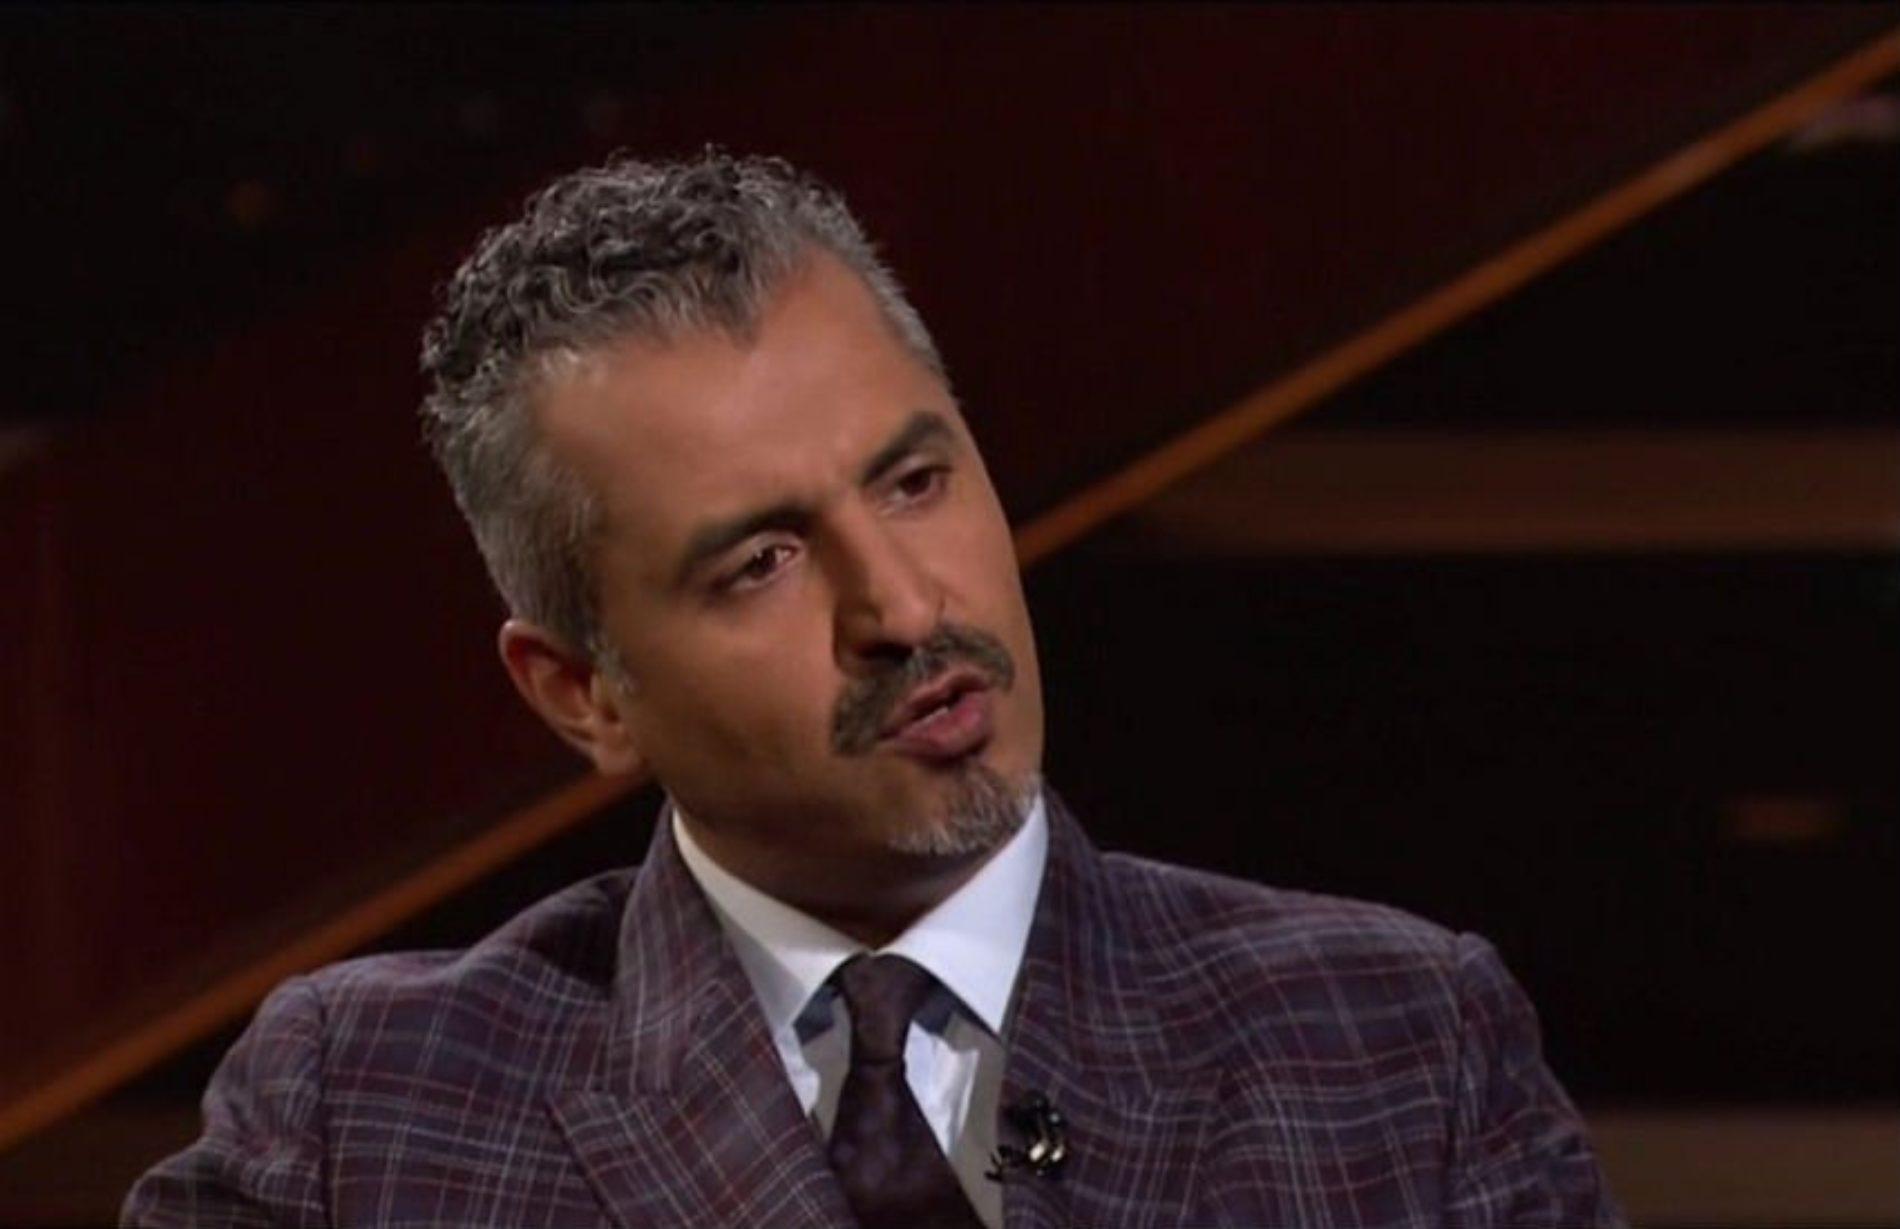 'Islam has a history of homophobia,' says Muslim radio show host Maajid Nawaz